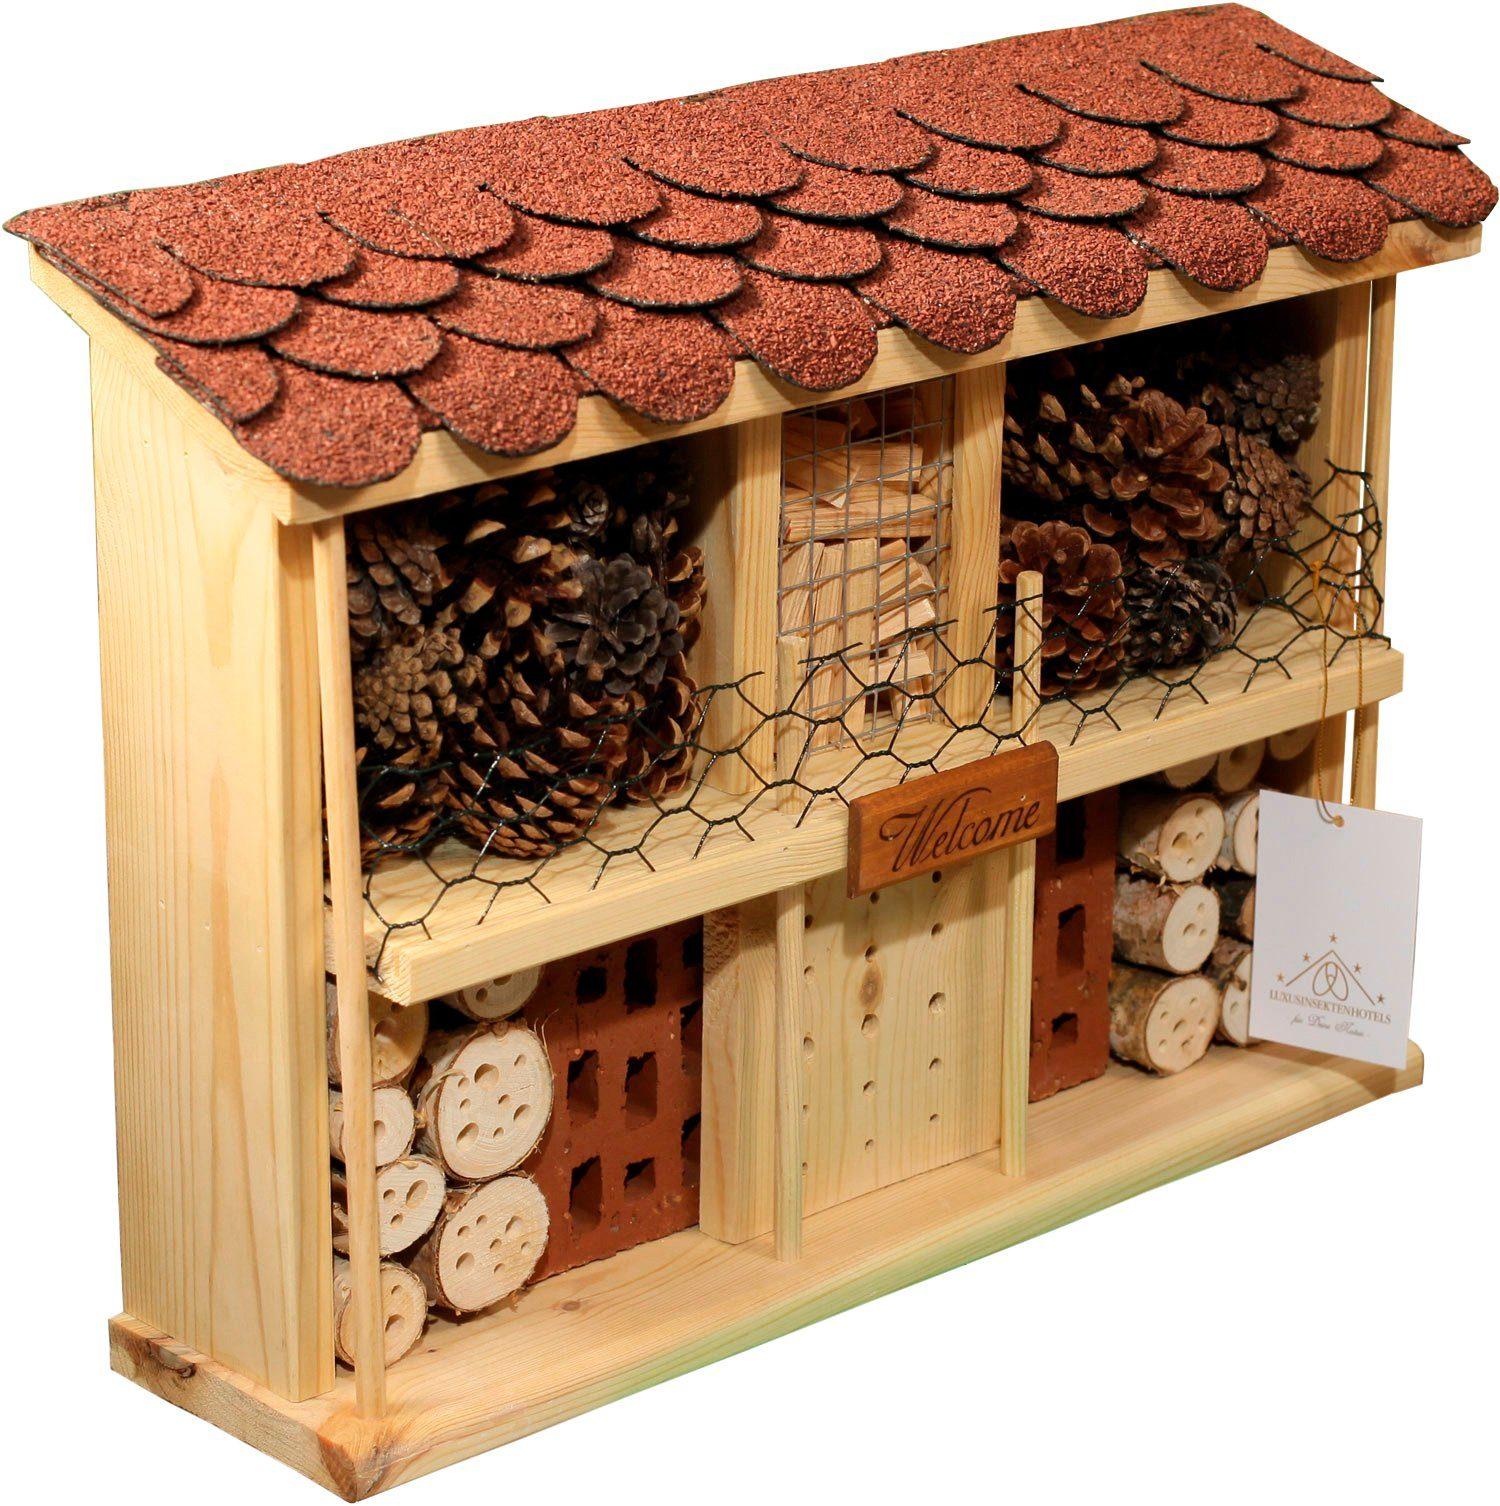 LUXUSINSEKTENHOTELS Insektenhotel »Landsitz Komfort«, BxTxH: 47x12,5x34 cm, fertig montiert